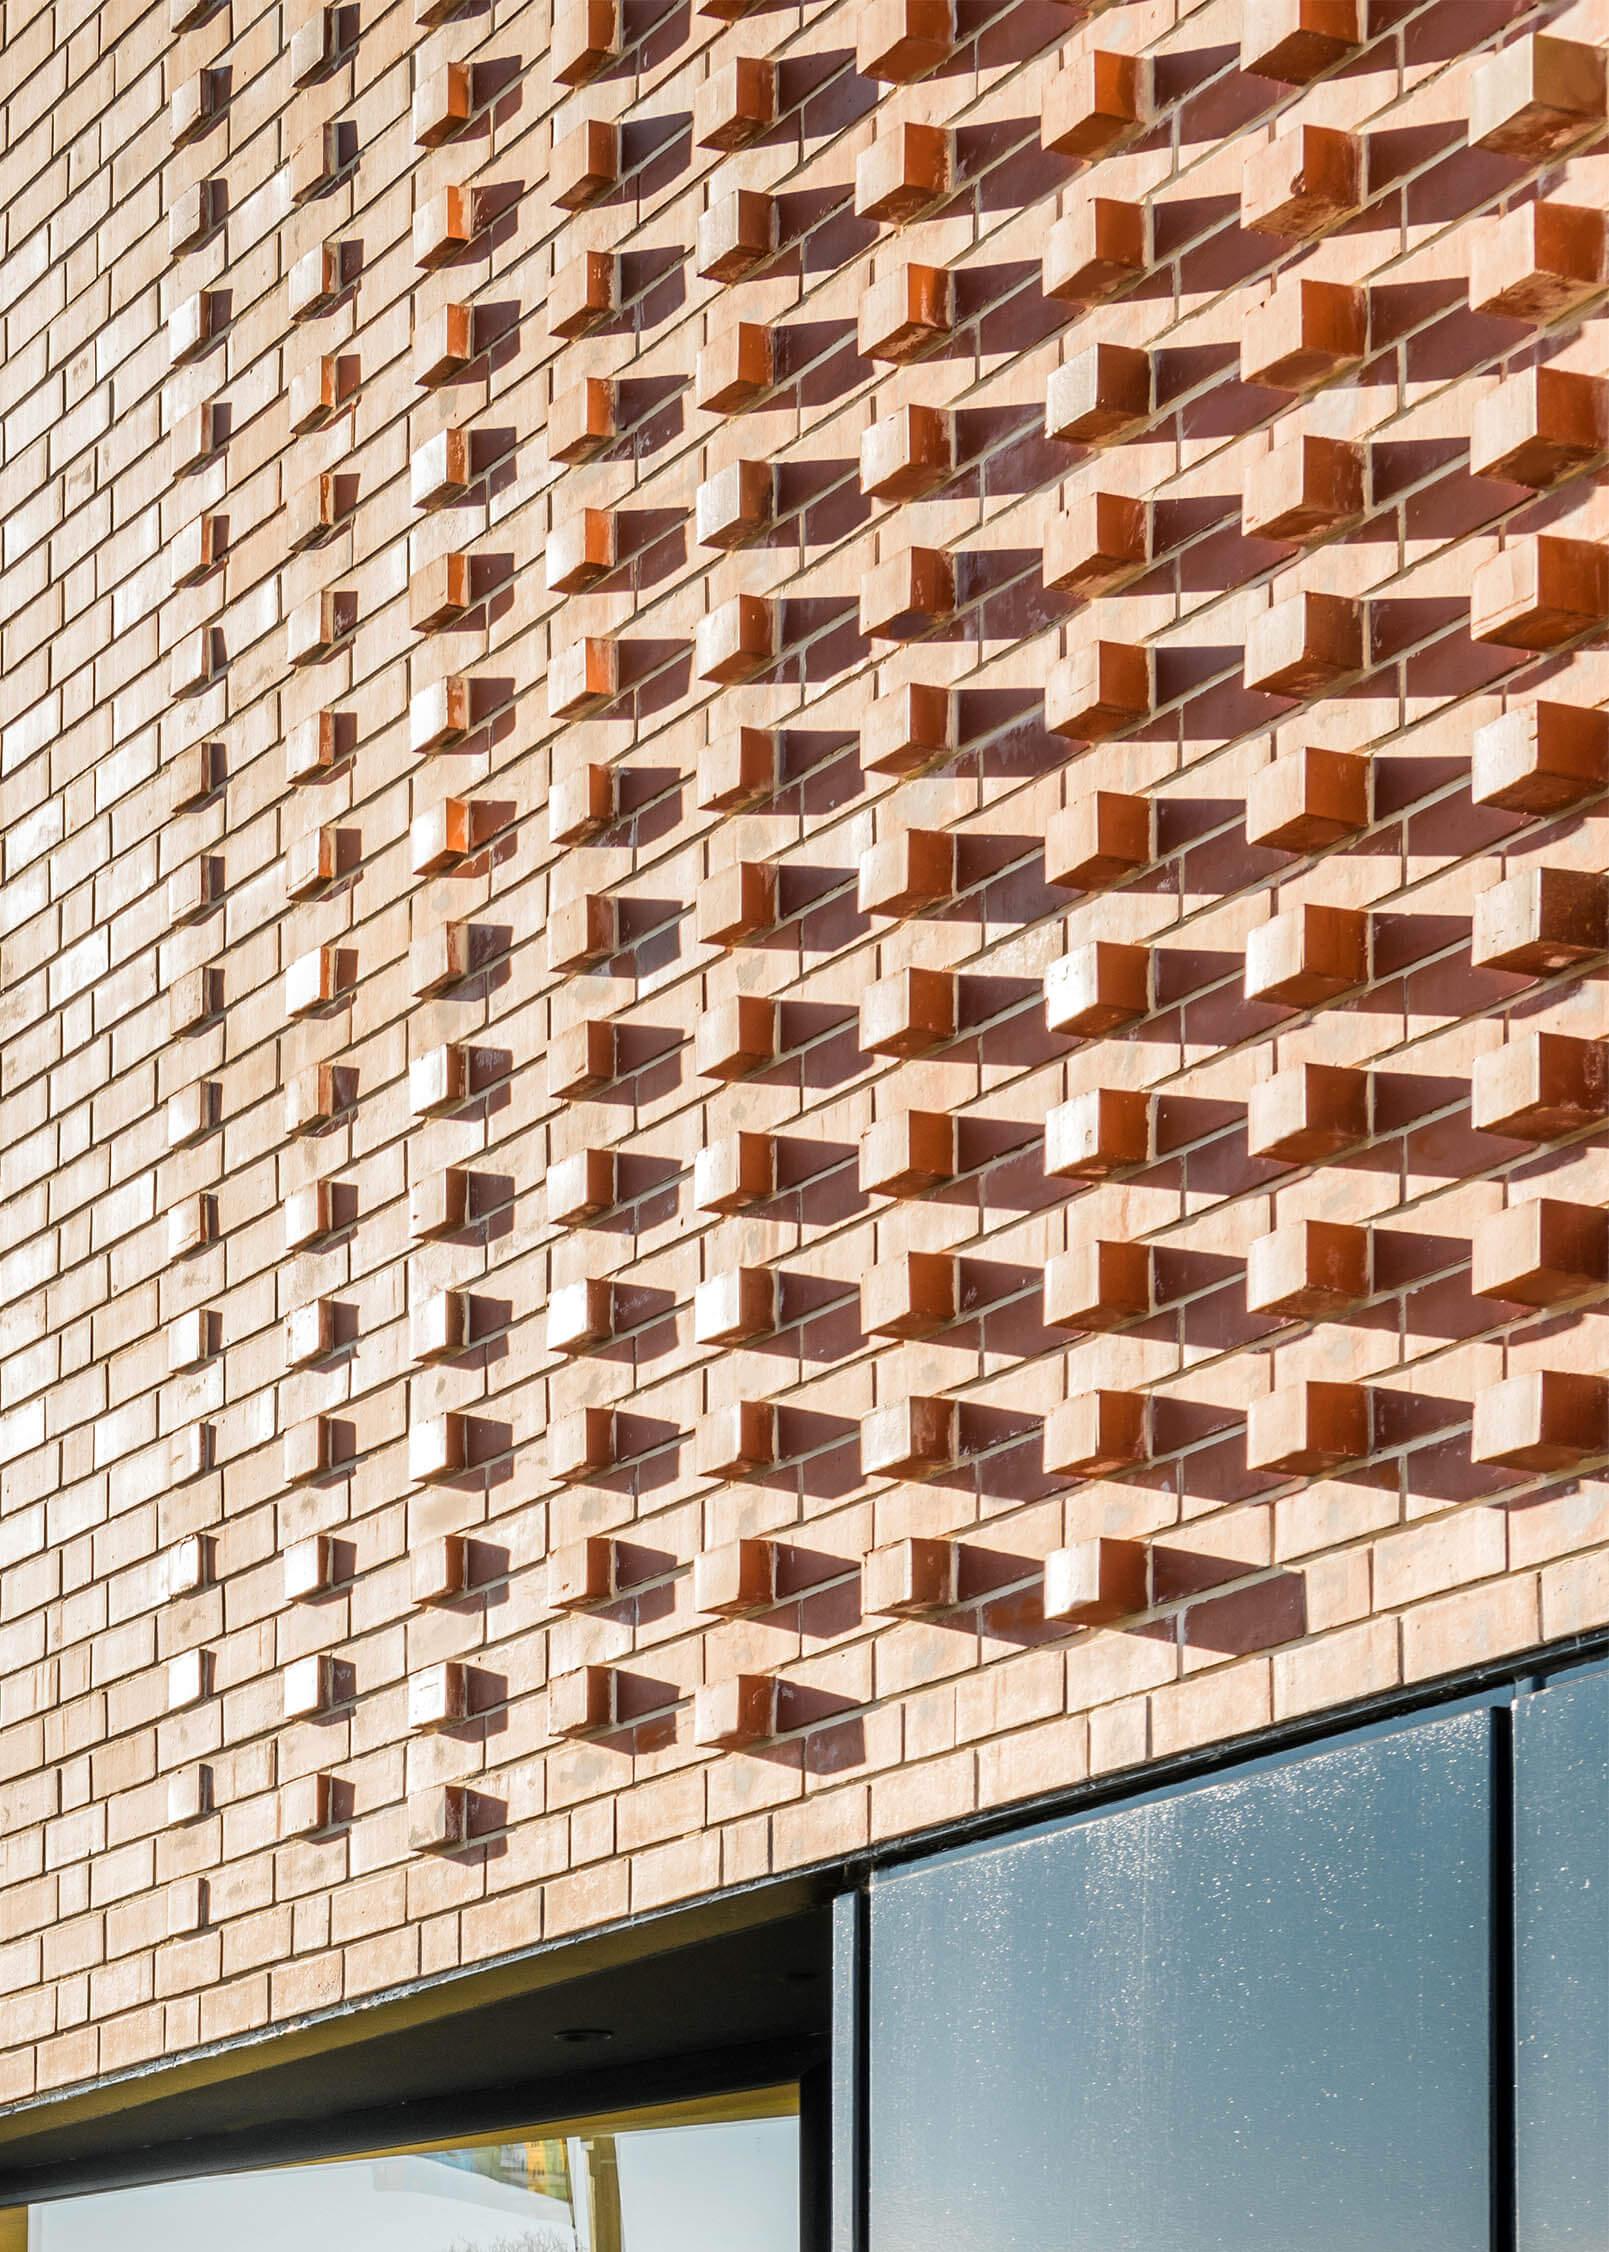 Feature red brick façade